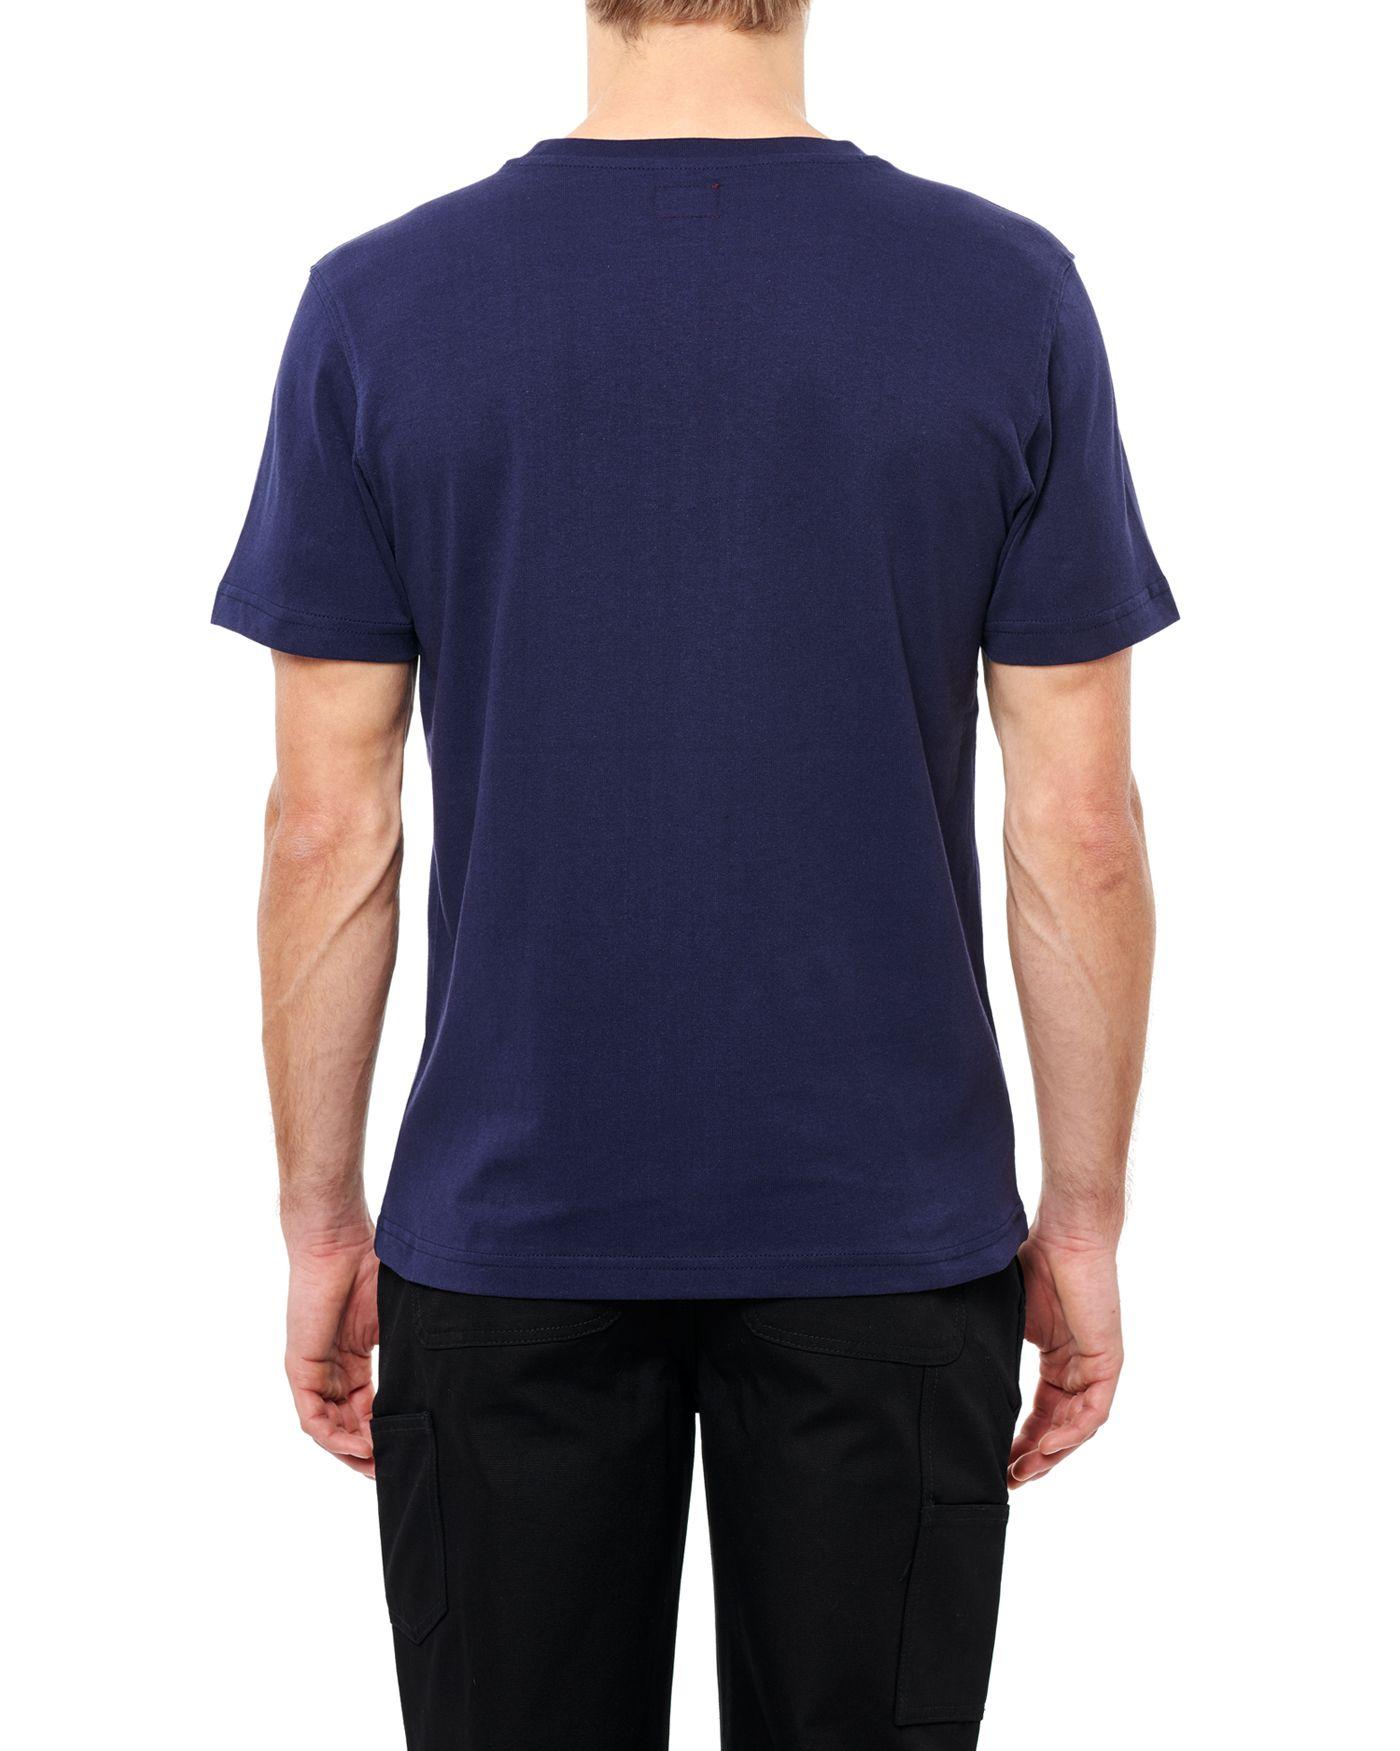 Photo of Retro Wheels S/S T-shirt, Navy